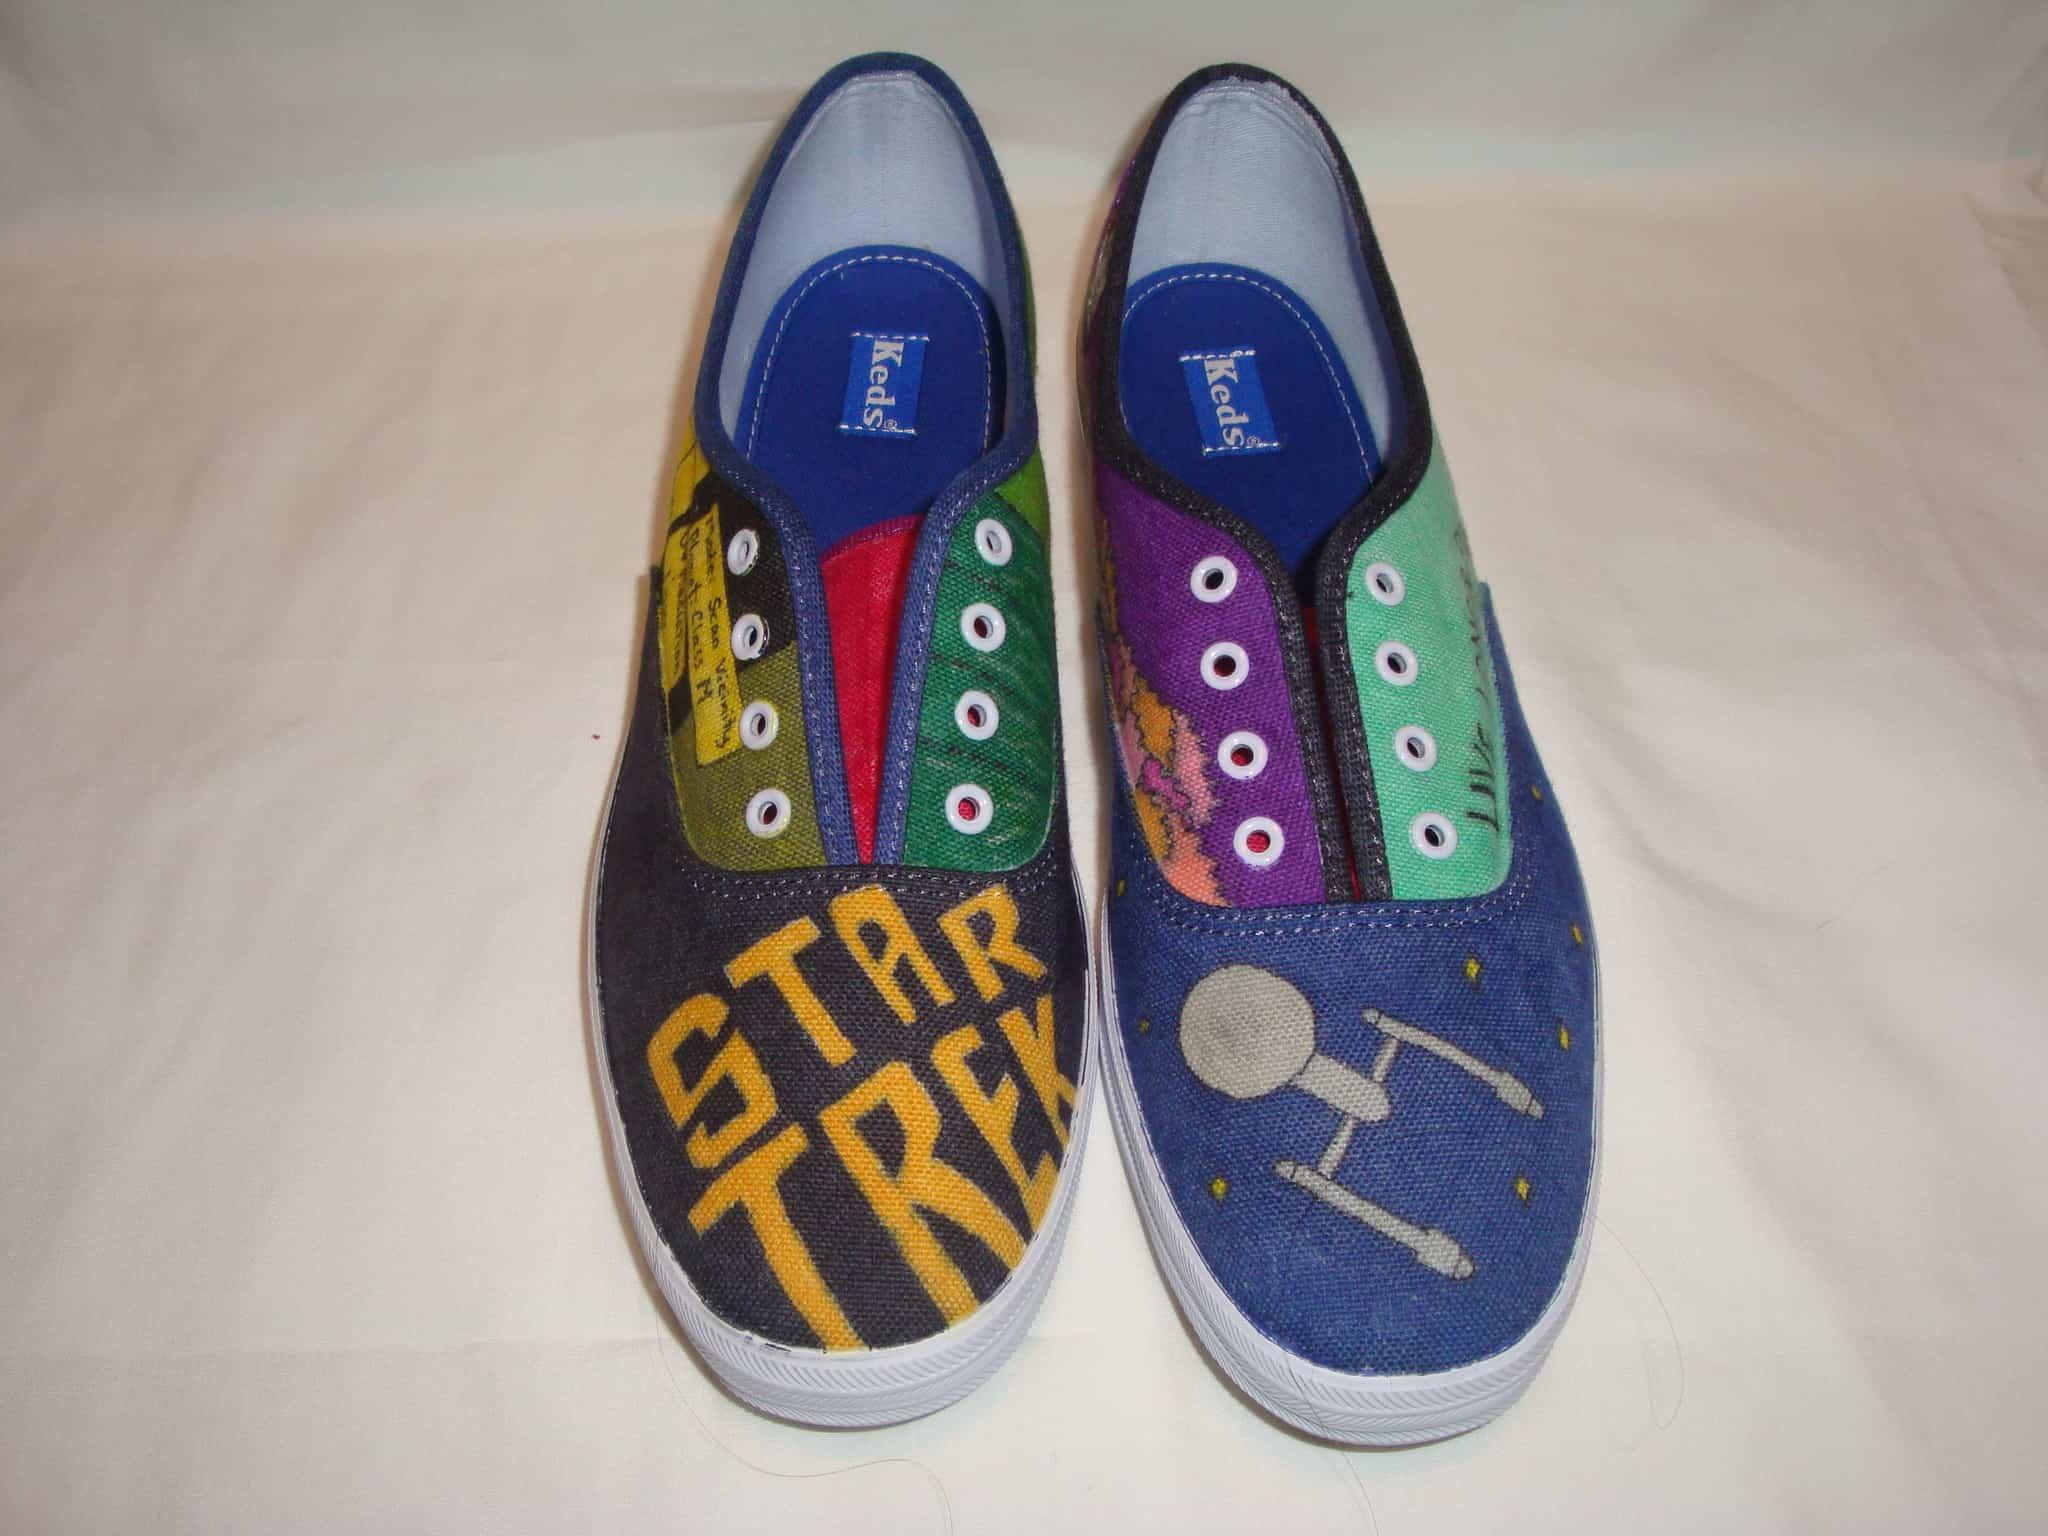 Hand drawn Star Trek shoes